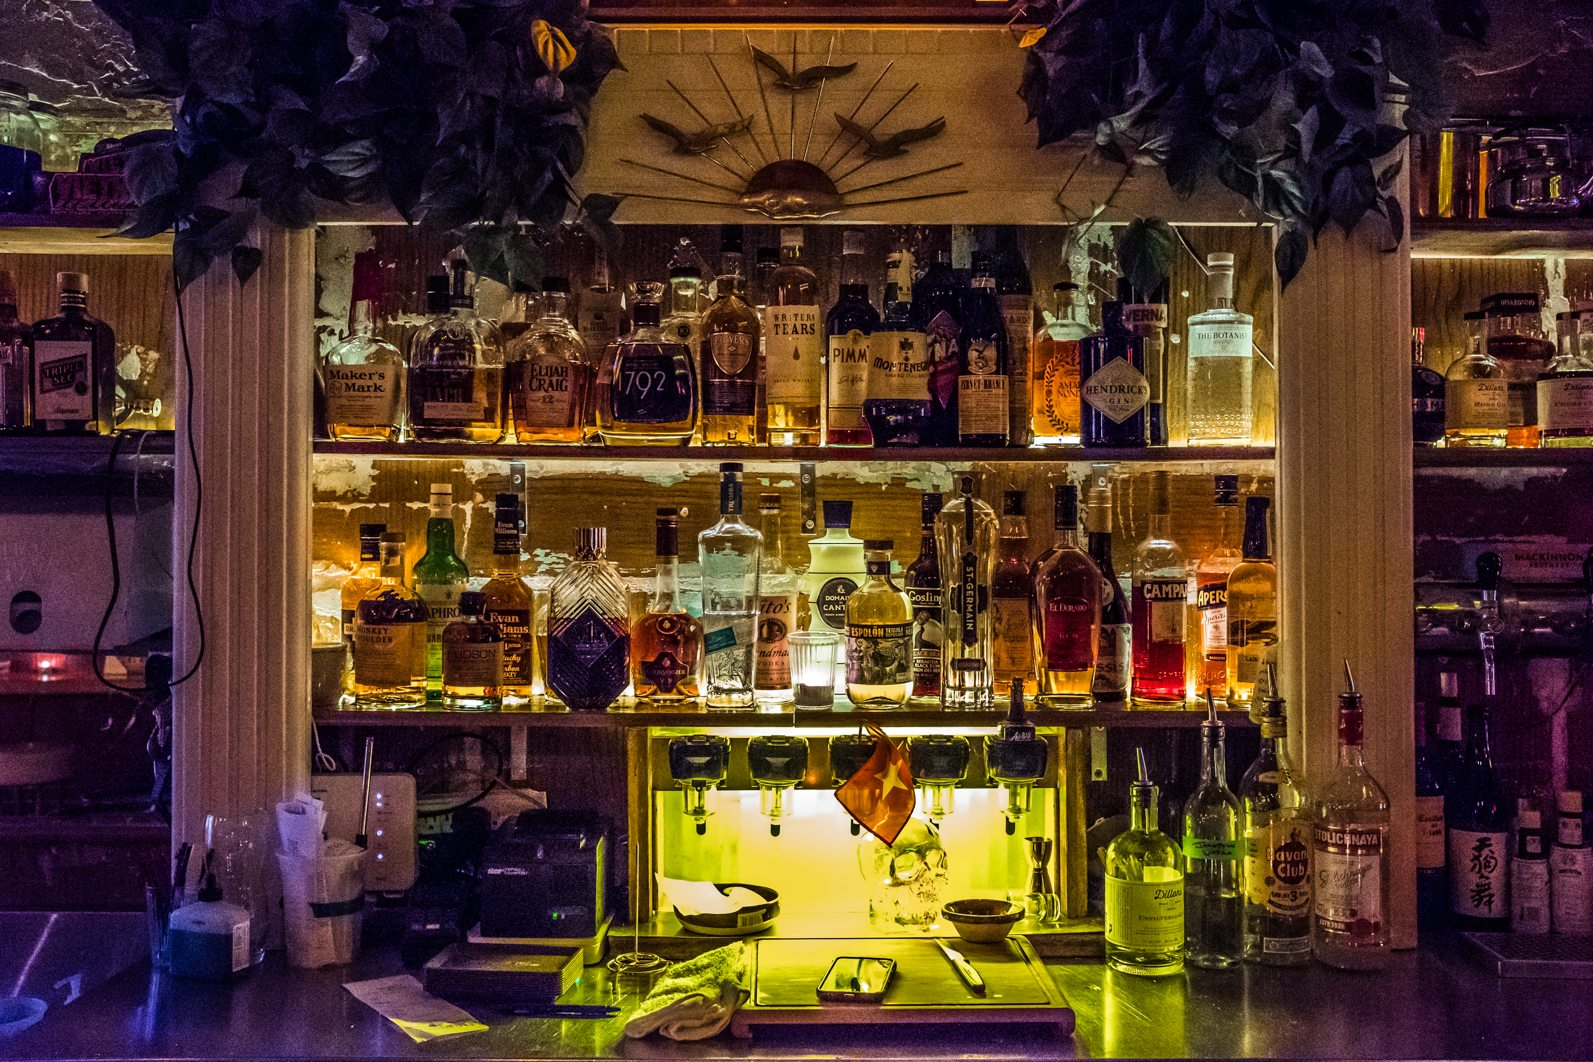 toronto-restaurants-pinkys-ca-phe-vietnamese-cambodian-snack-bar-little-italy-room-5